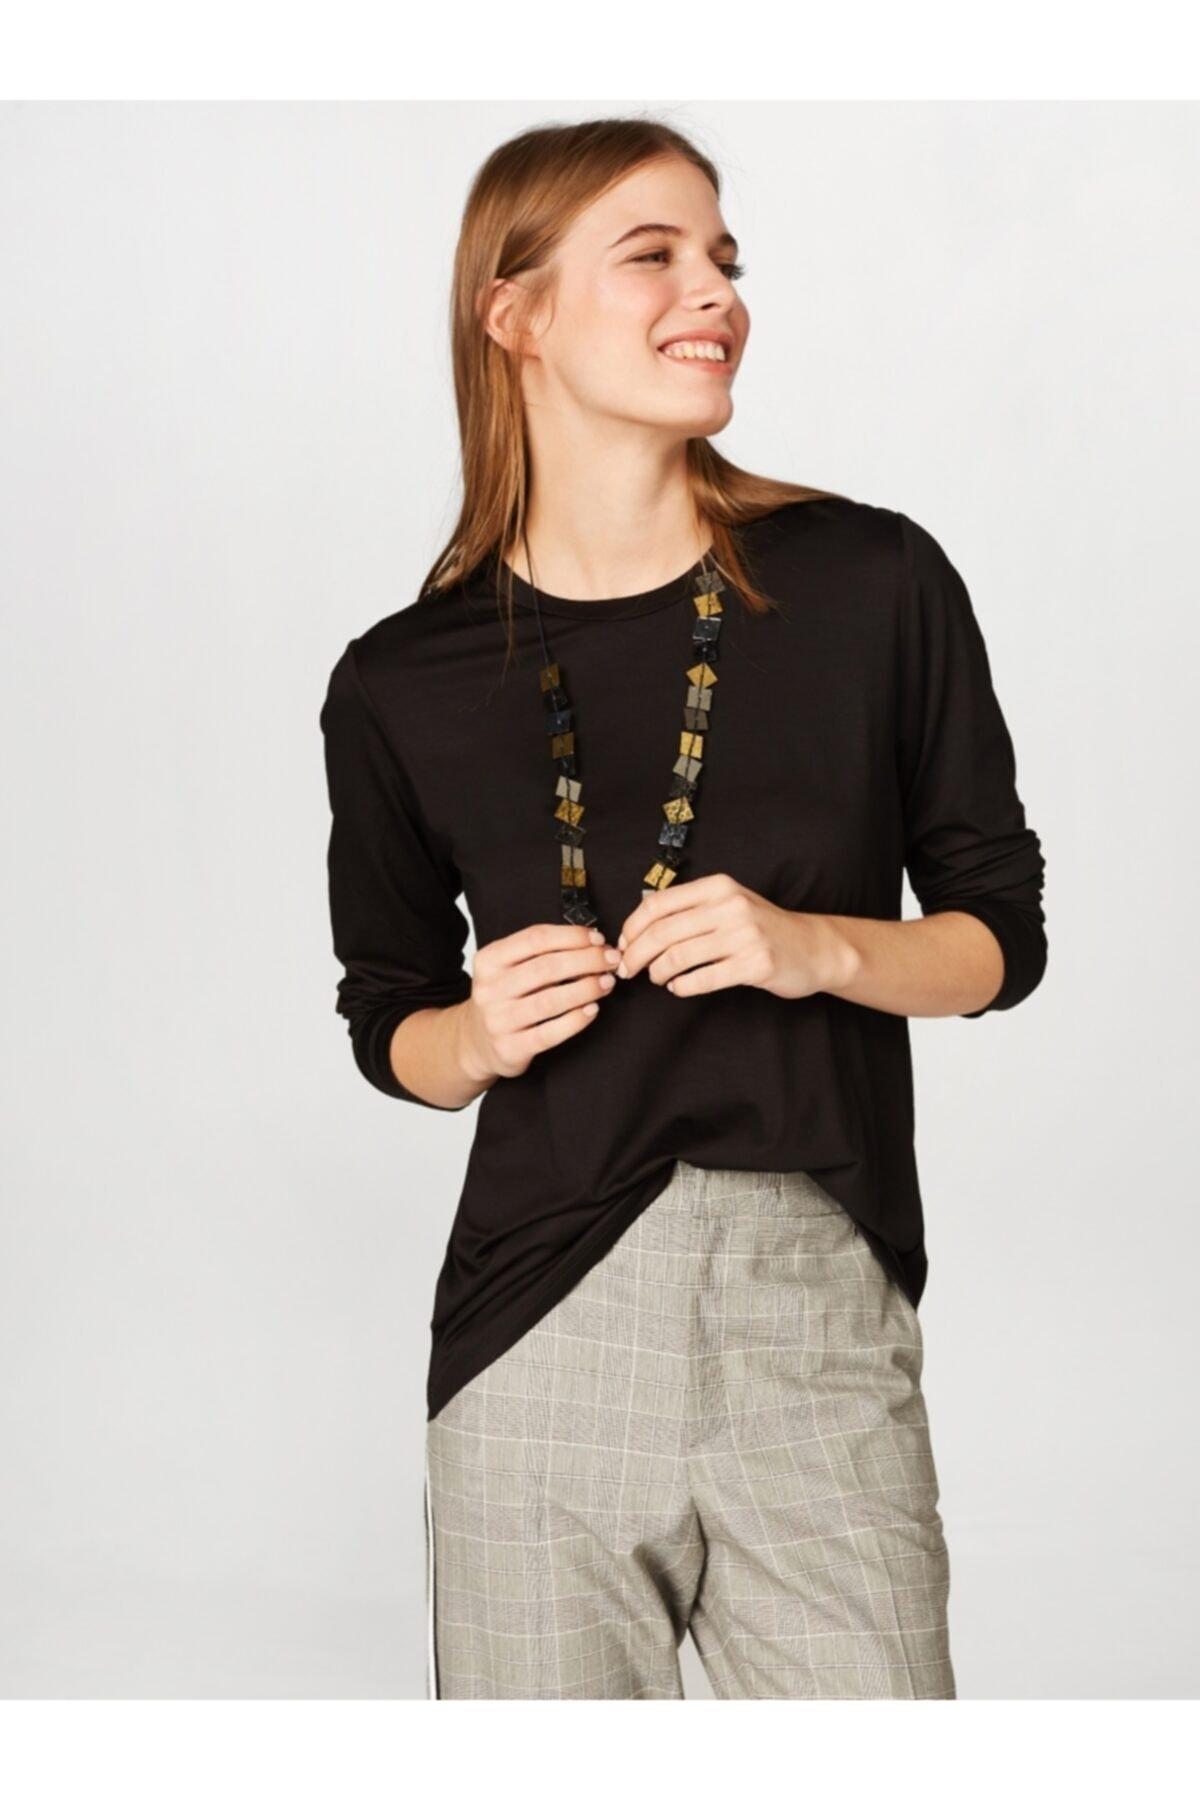 Kadın Yuvarlak Yaka Uzun Kol T-shirt